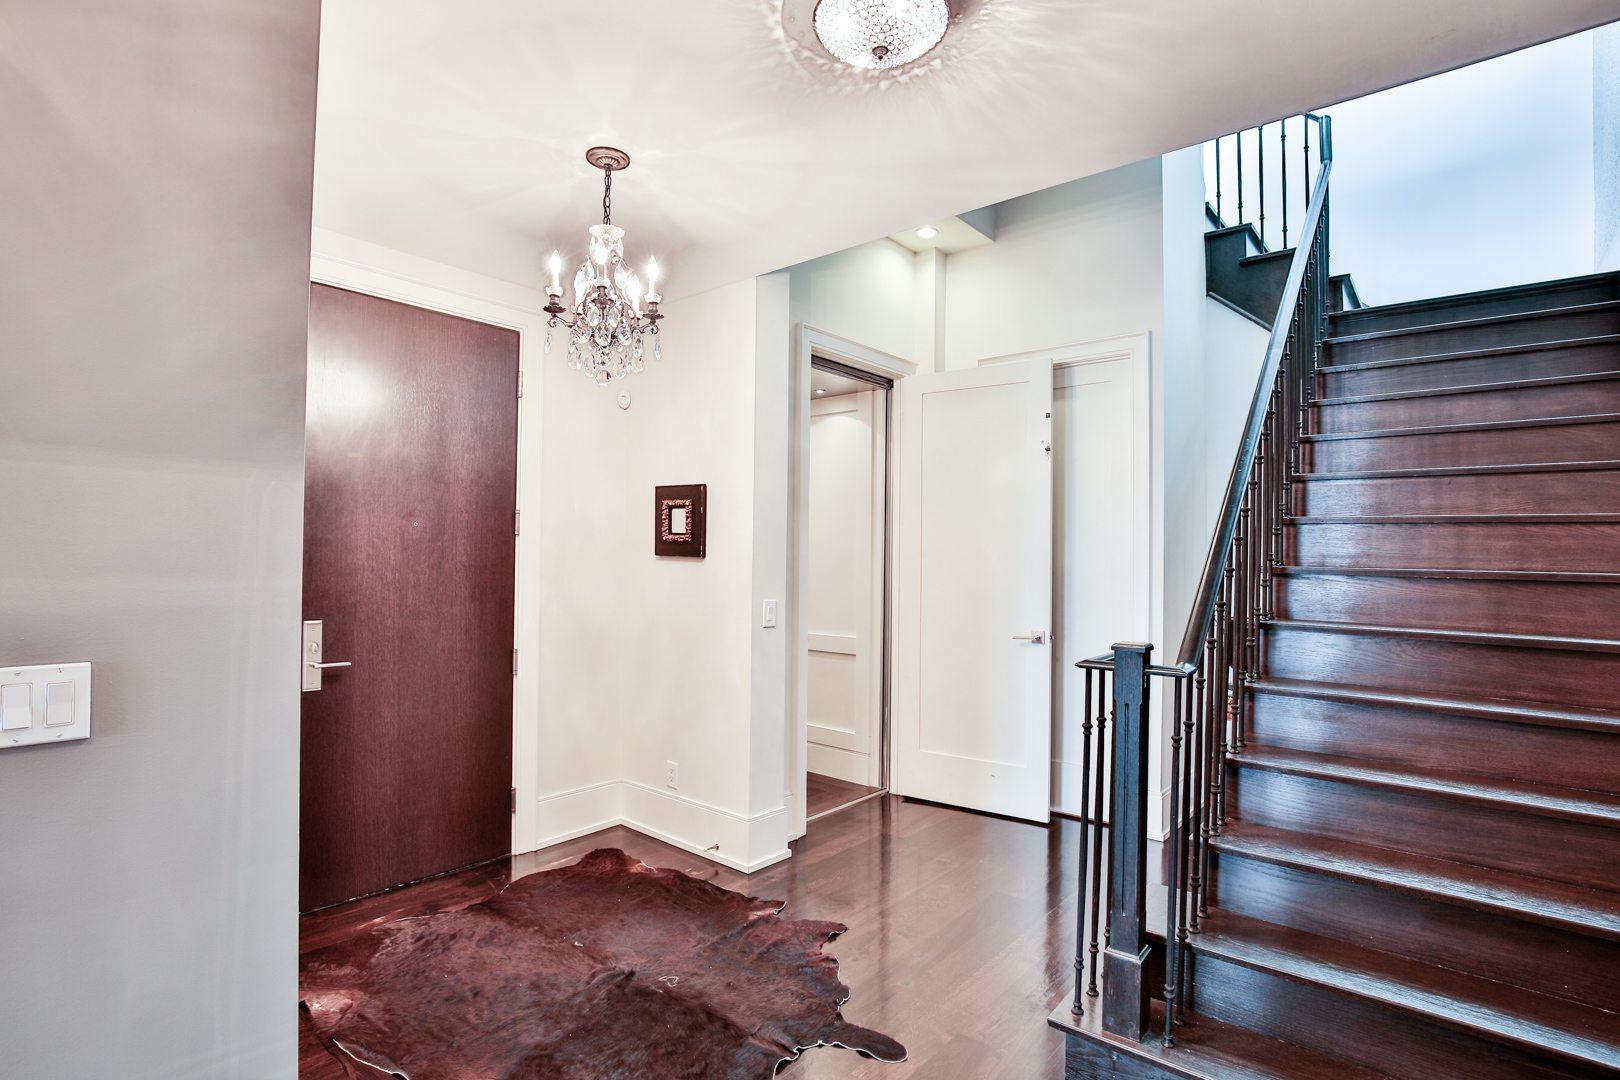 toronto-condo-sold-70-roehampton-avenue-1